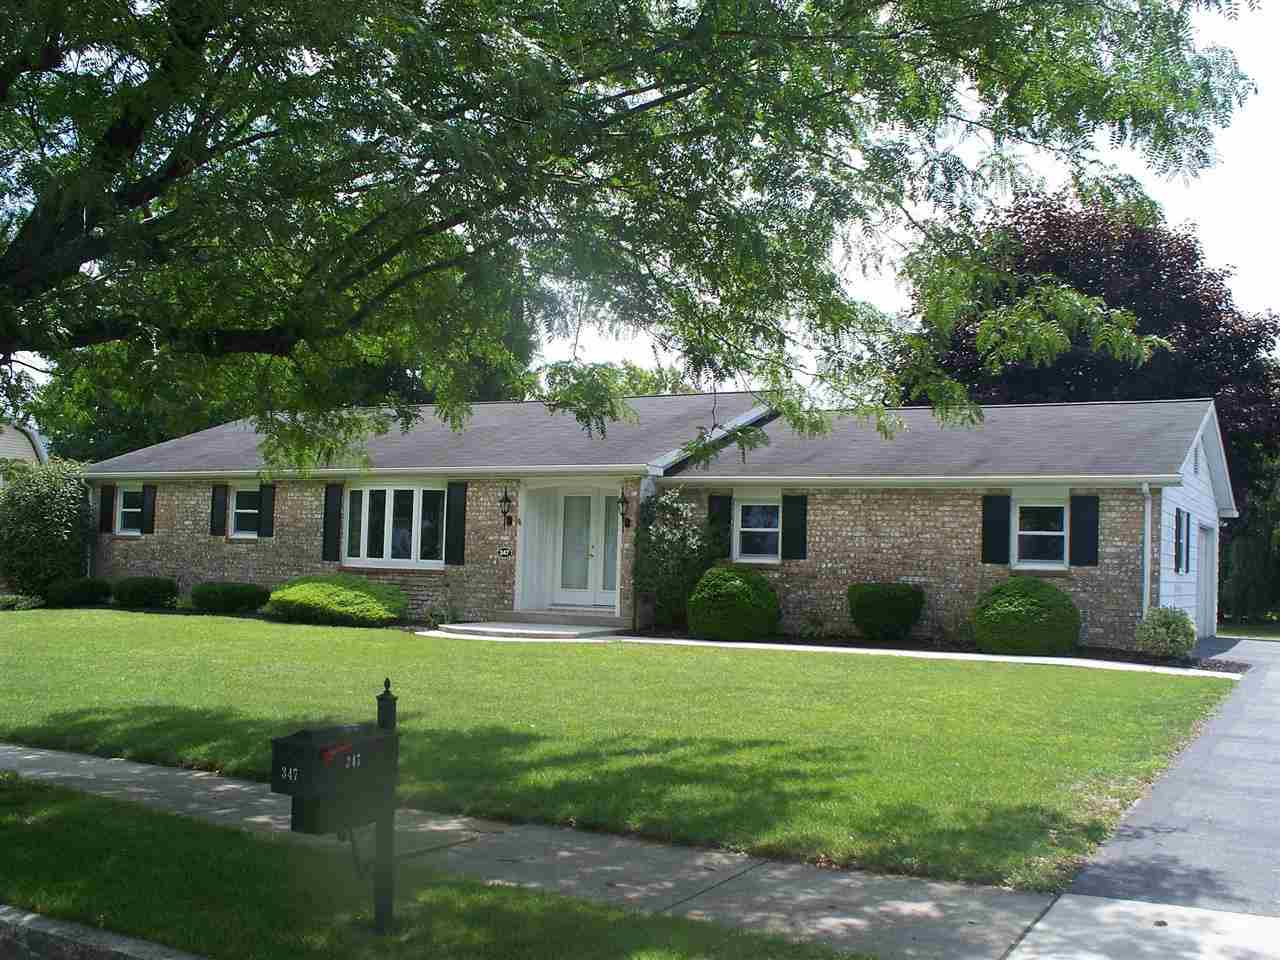 347 Parkway Dr, Littlestown, PA 17340